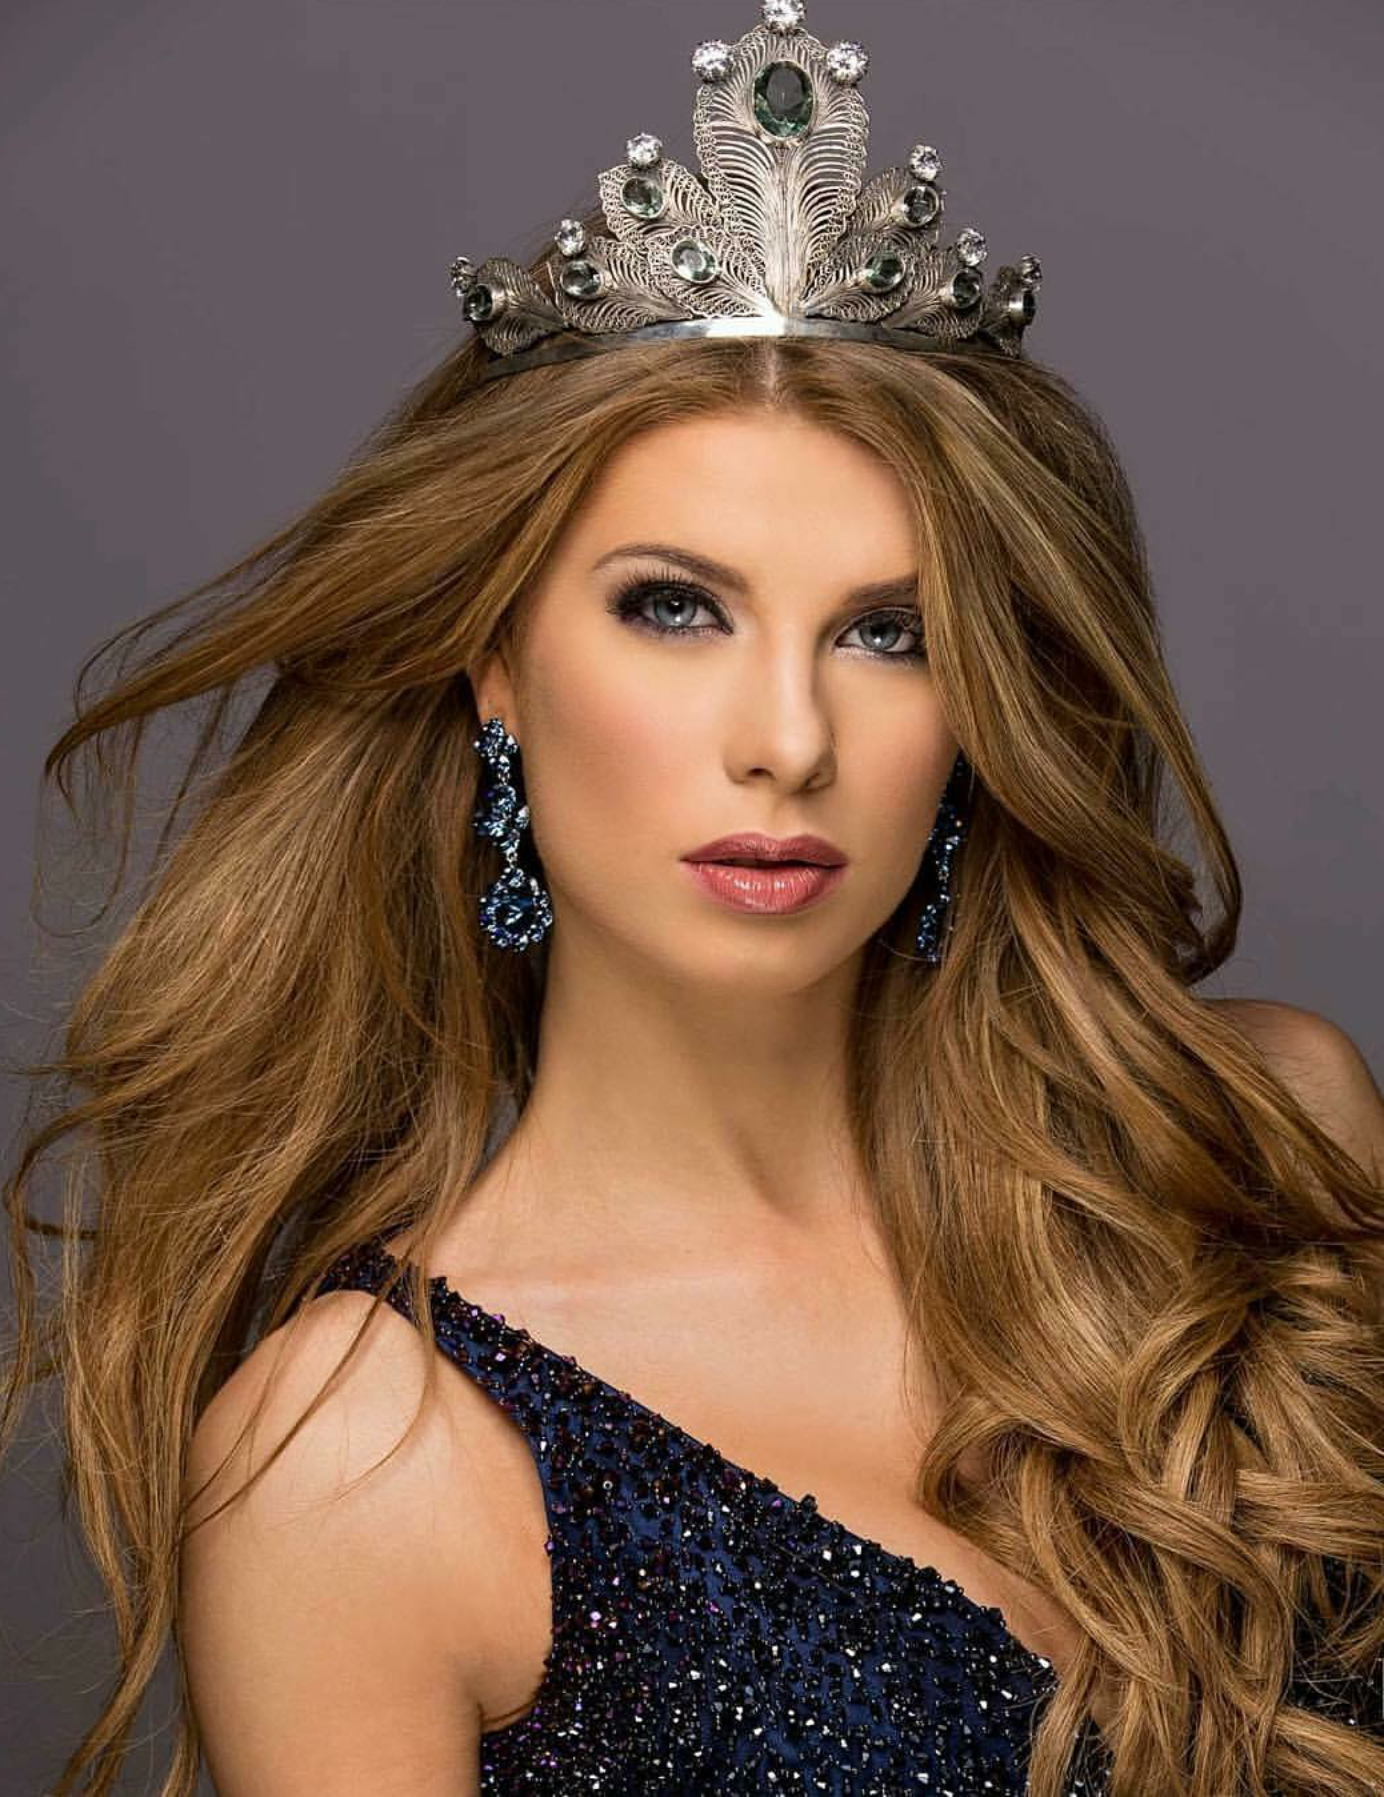 Miss Denmark Universe 2016